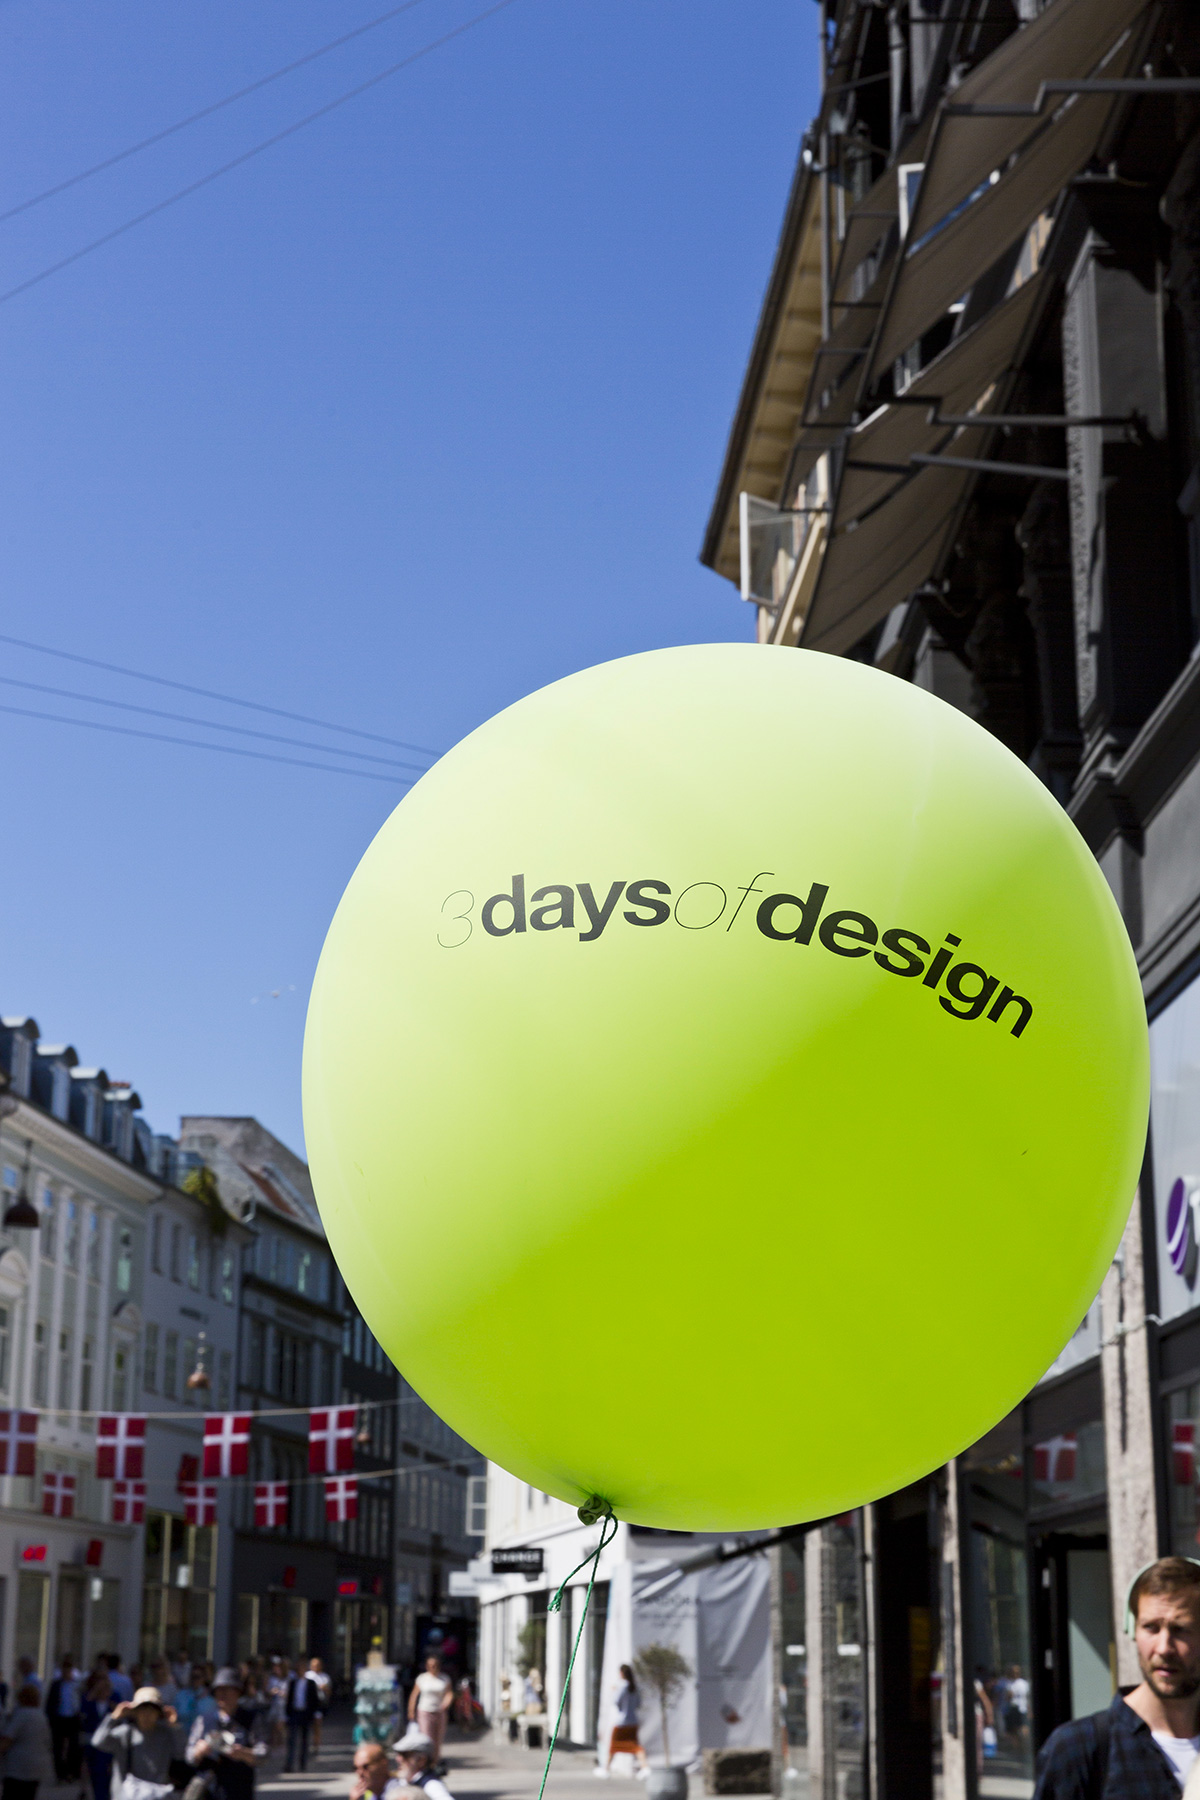 3 days of design